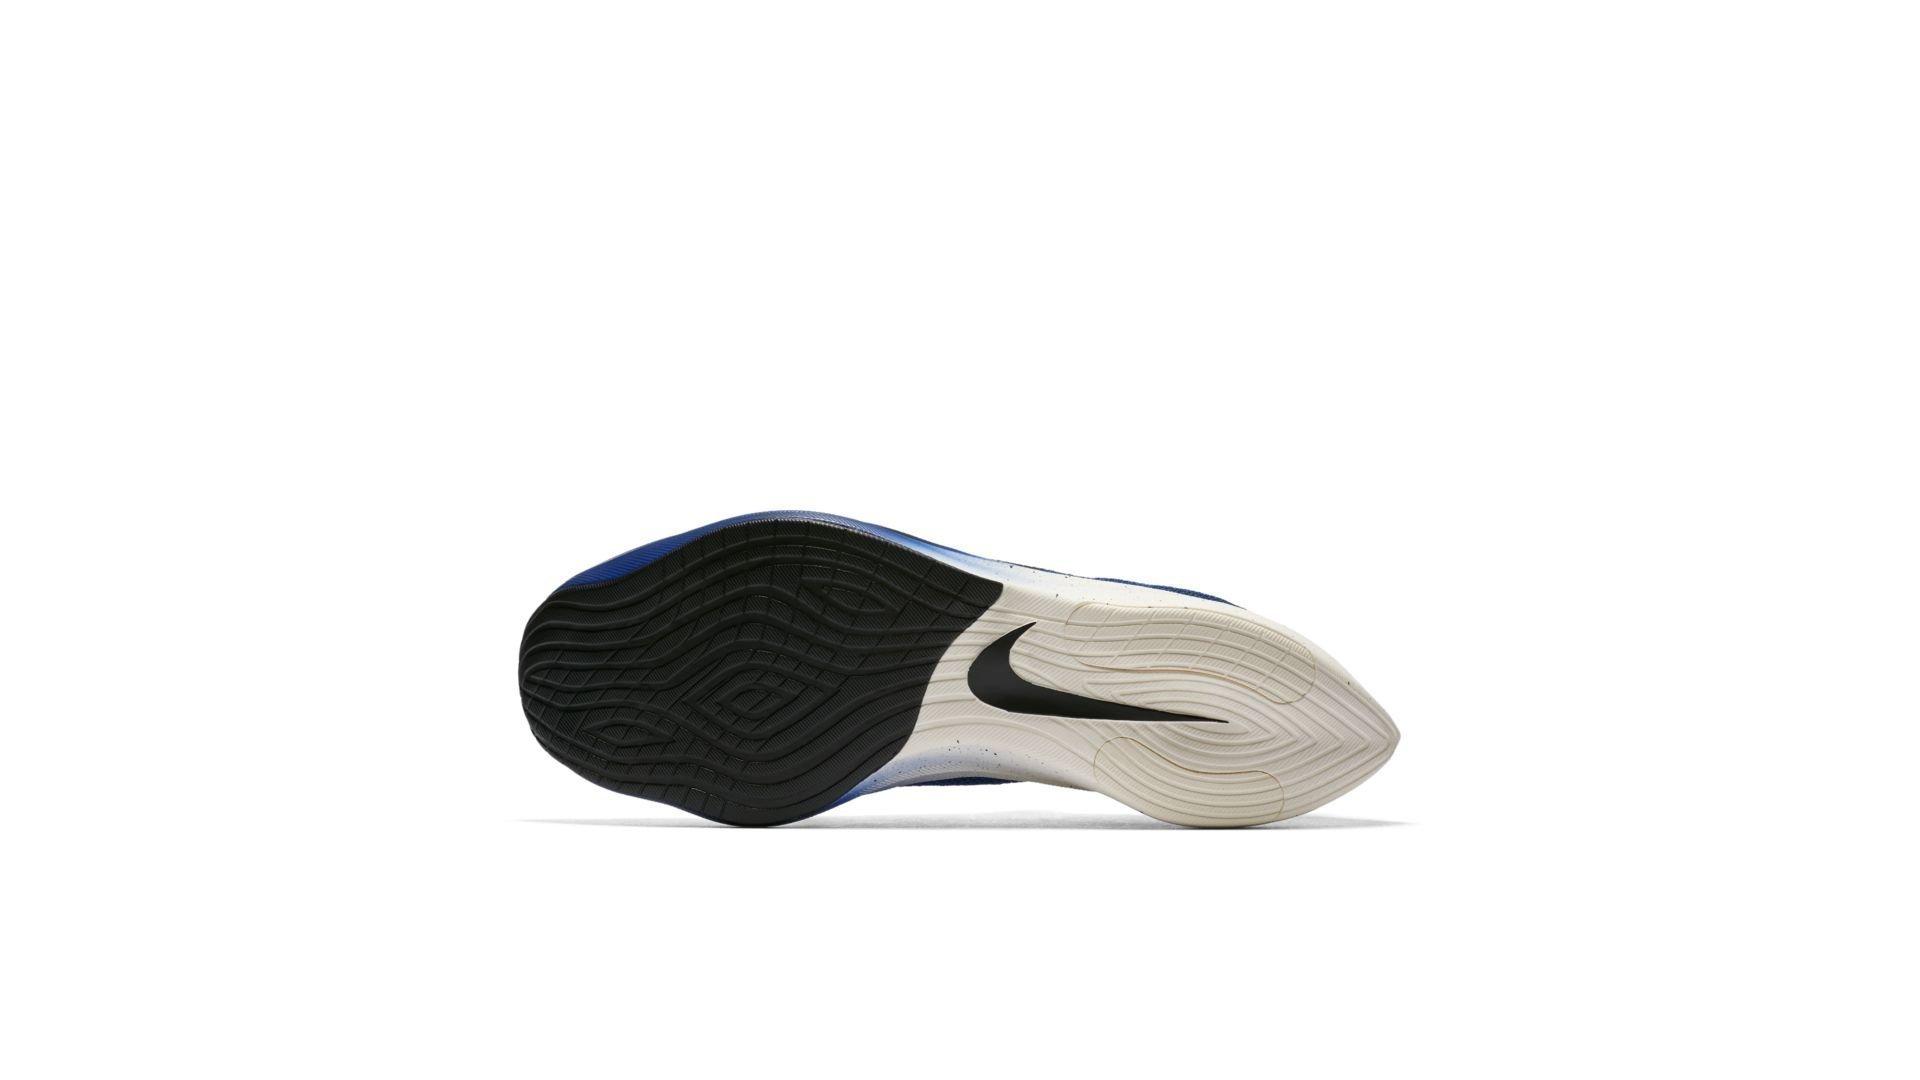 Nike Vapor Street Flyknit College Navy (AQ1763-400)